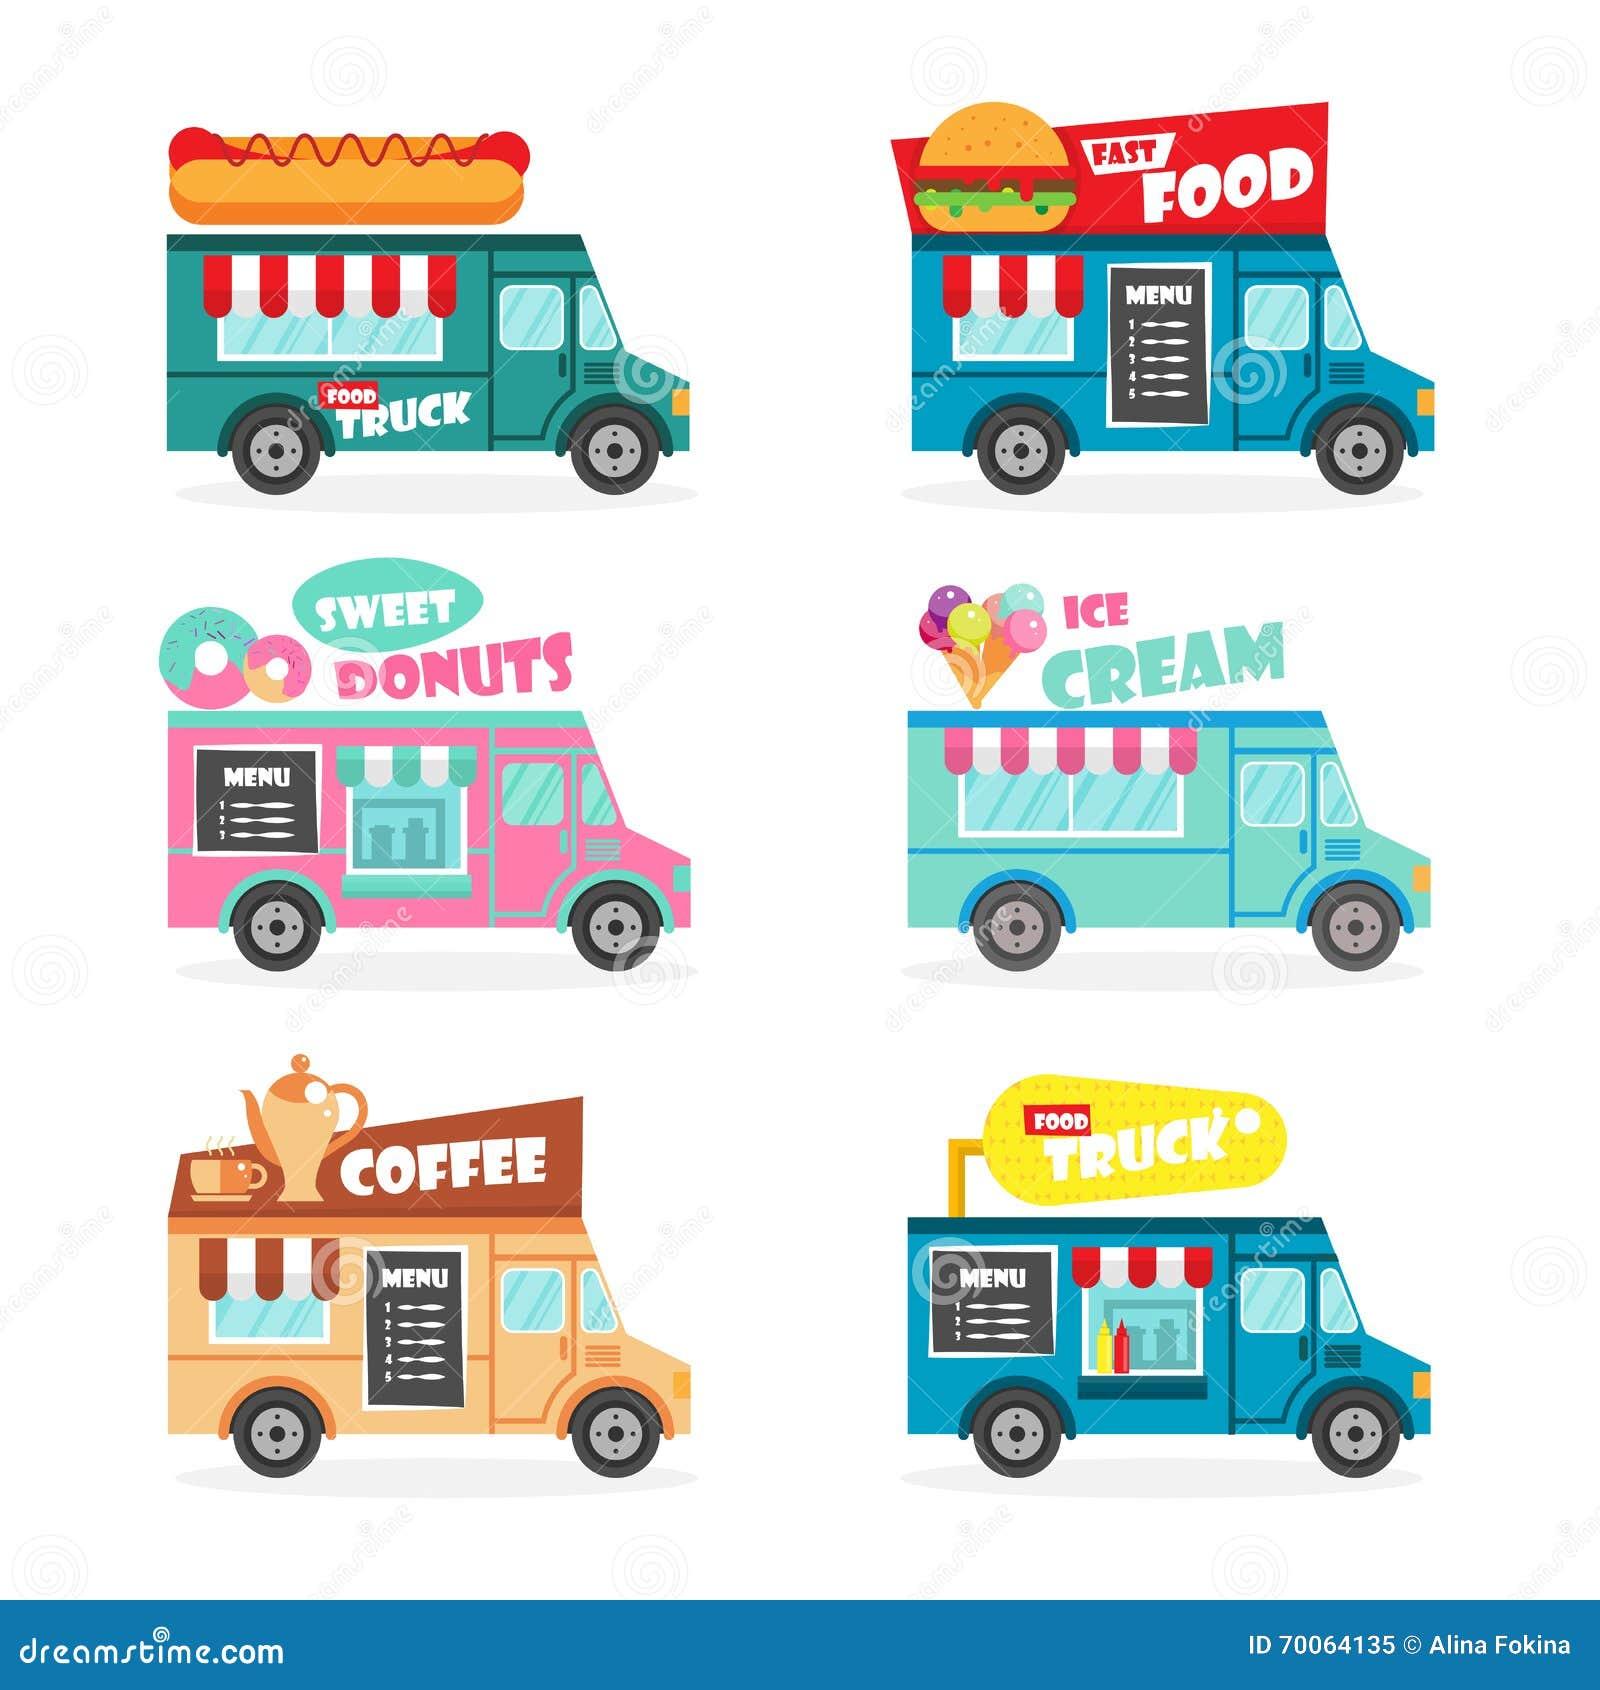 Tasty Dog Food Truck